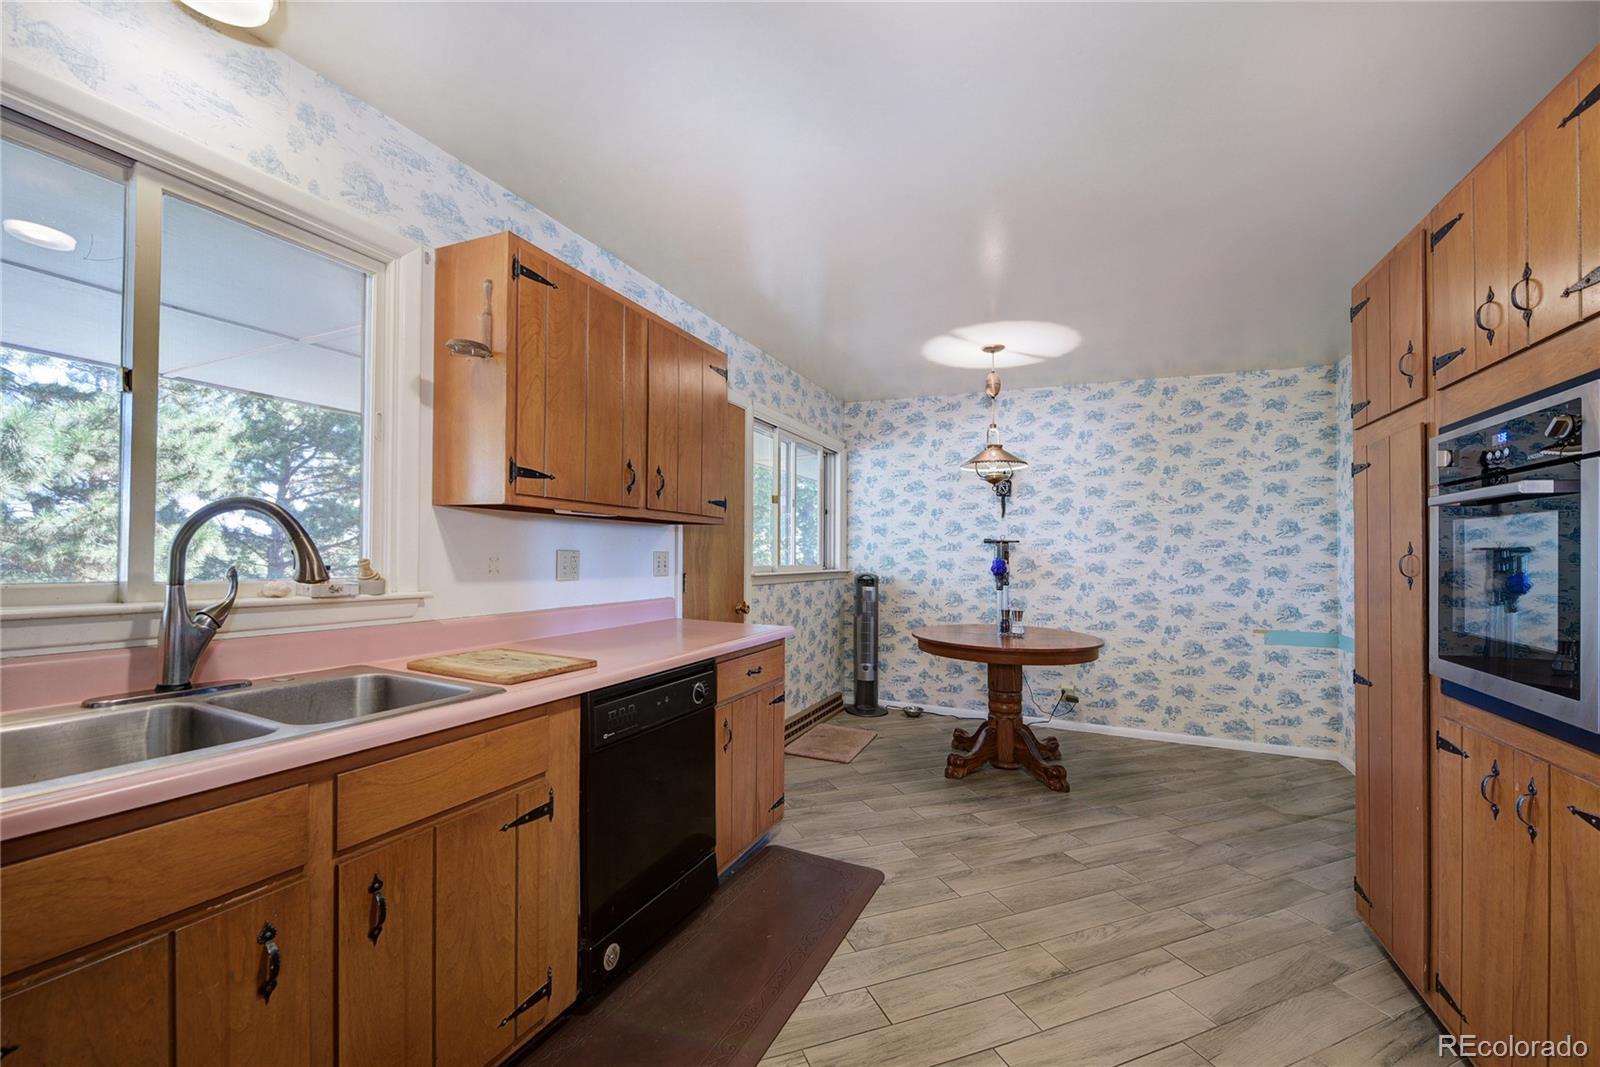 MLS# 3086362 - 20 - 2445 Balsam Drive, Boulder, CO 80304